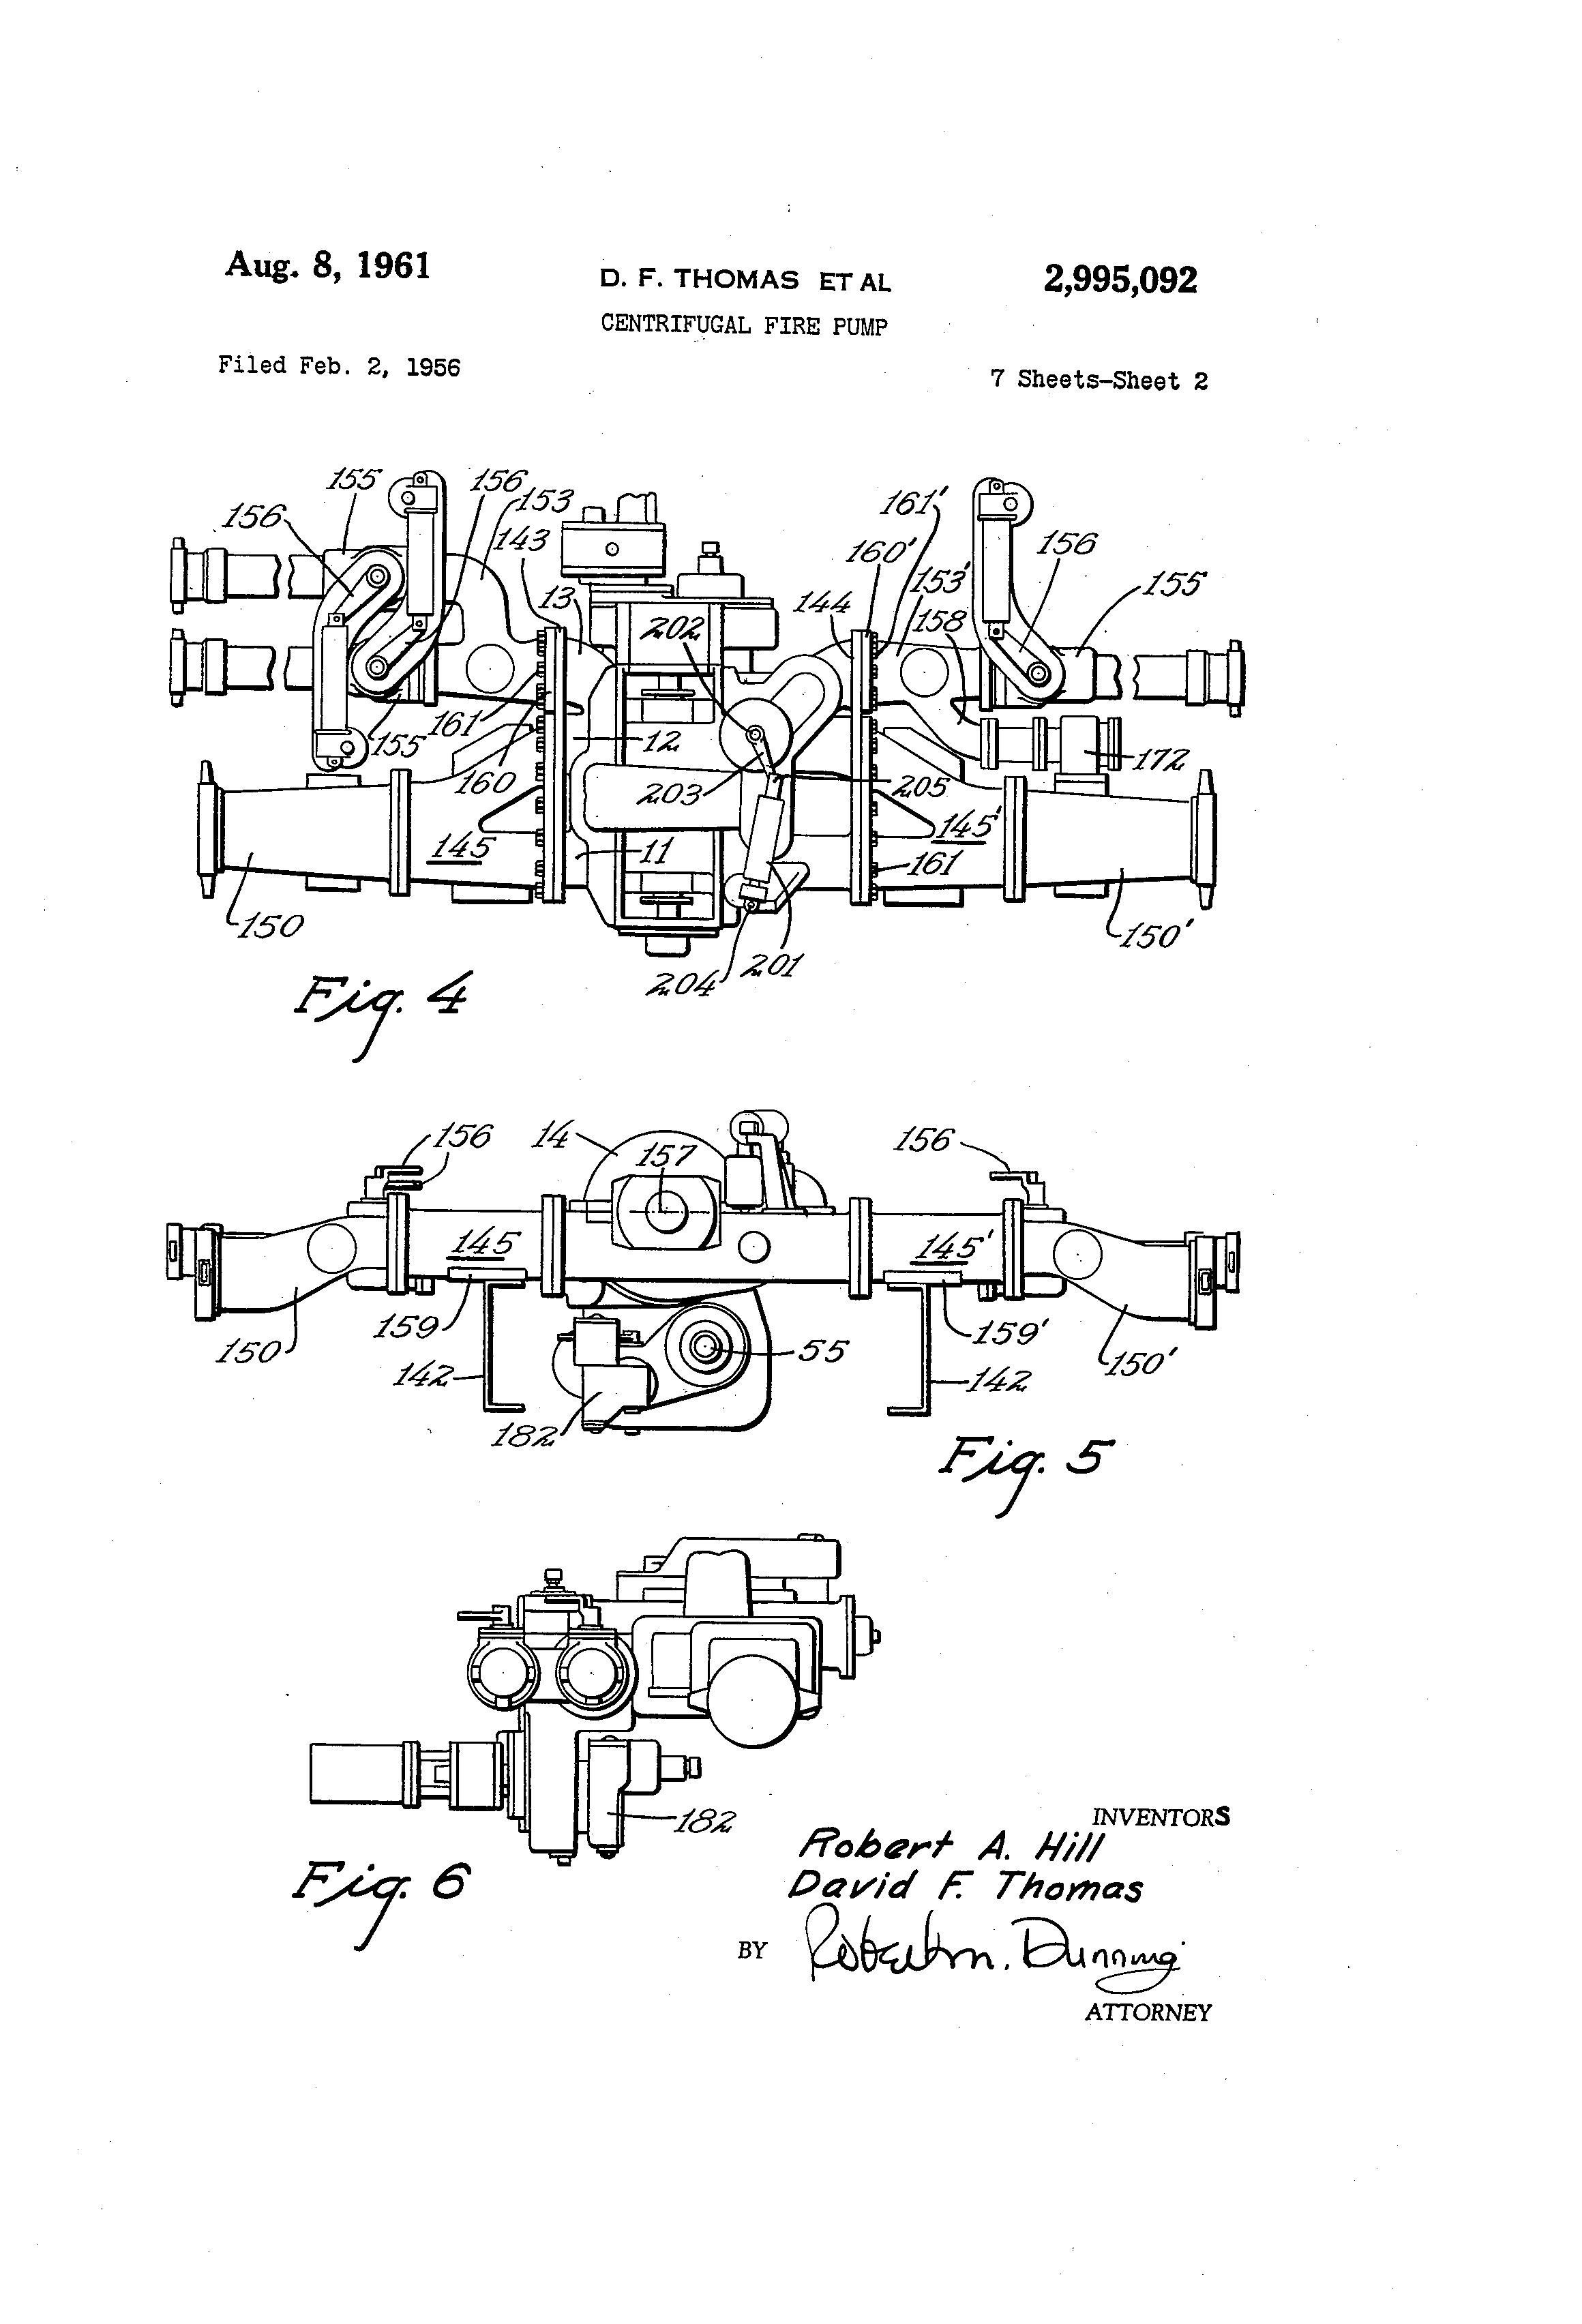 Truck Parts Diagram on Diagram Of 2000 Gmc Sierra Engine Partment